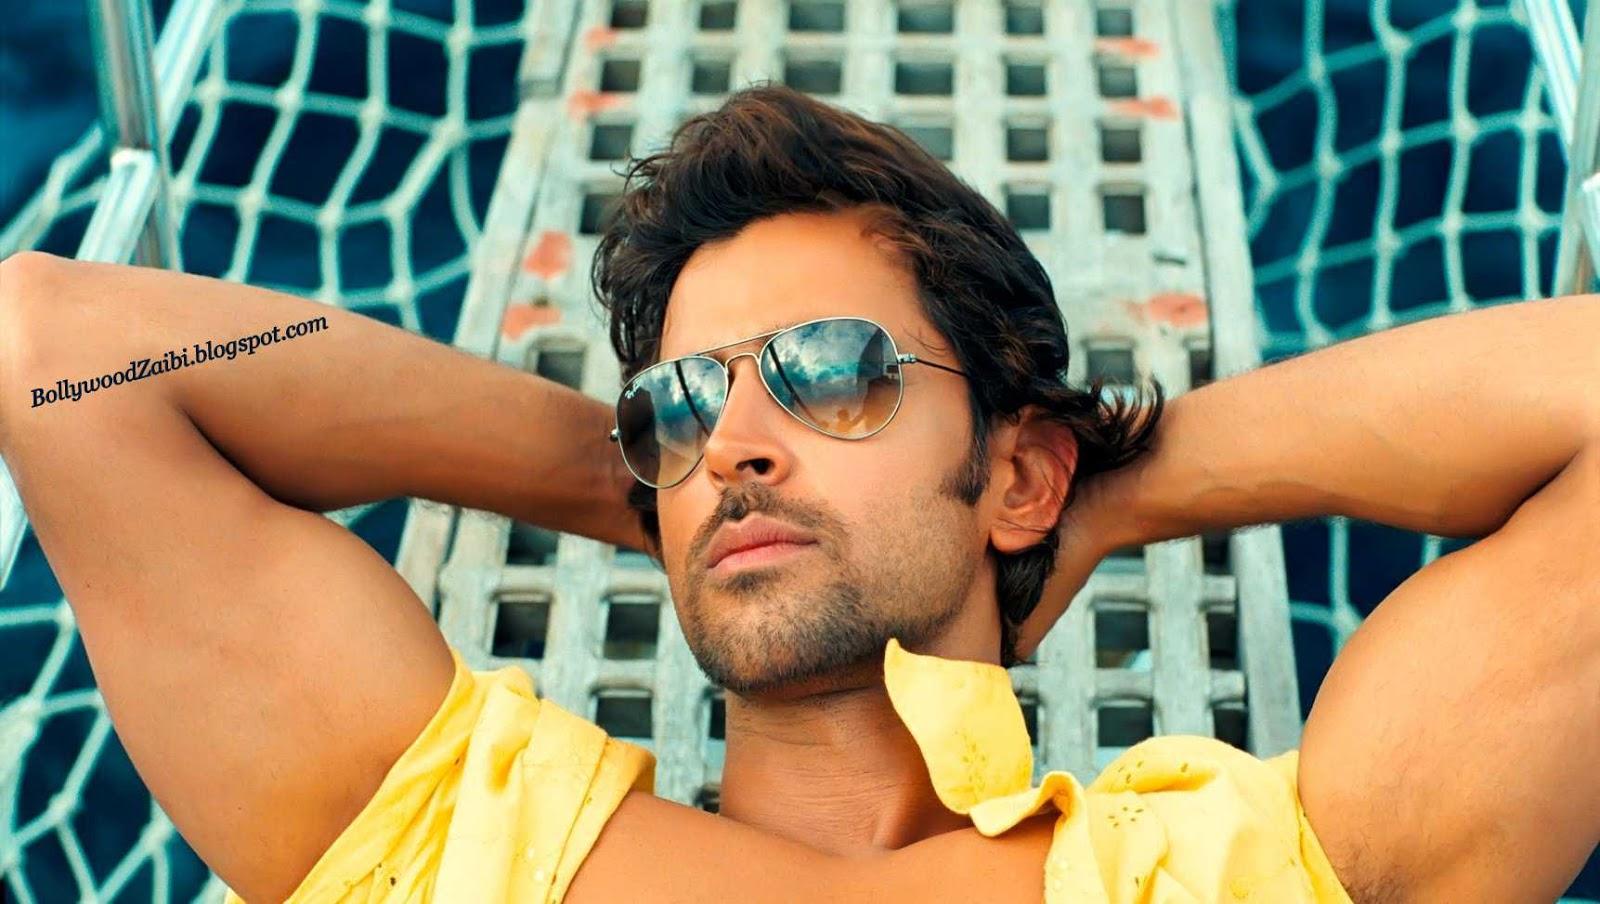 Hrithik Roshan in Kites HD Wallpaper | Bollywood Zaibi